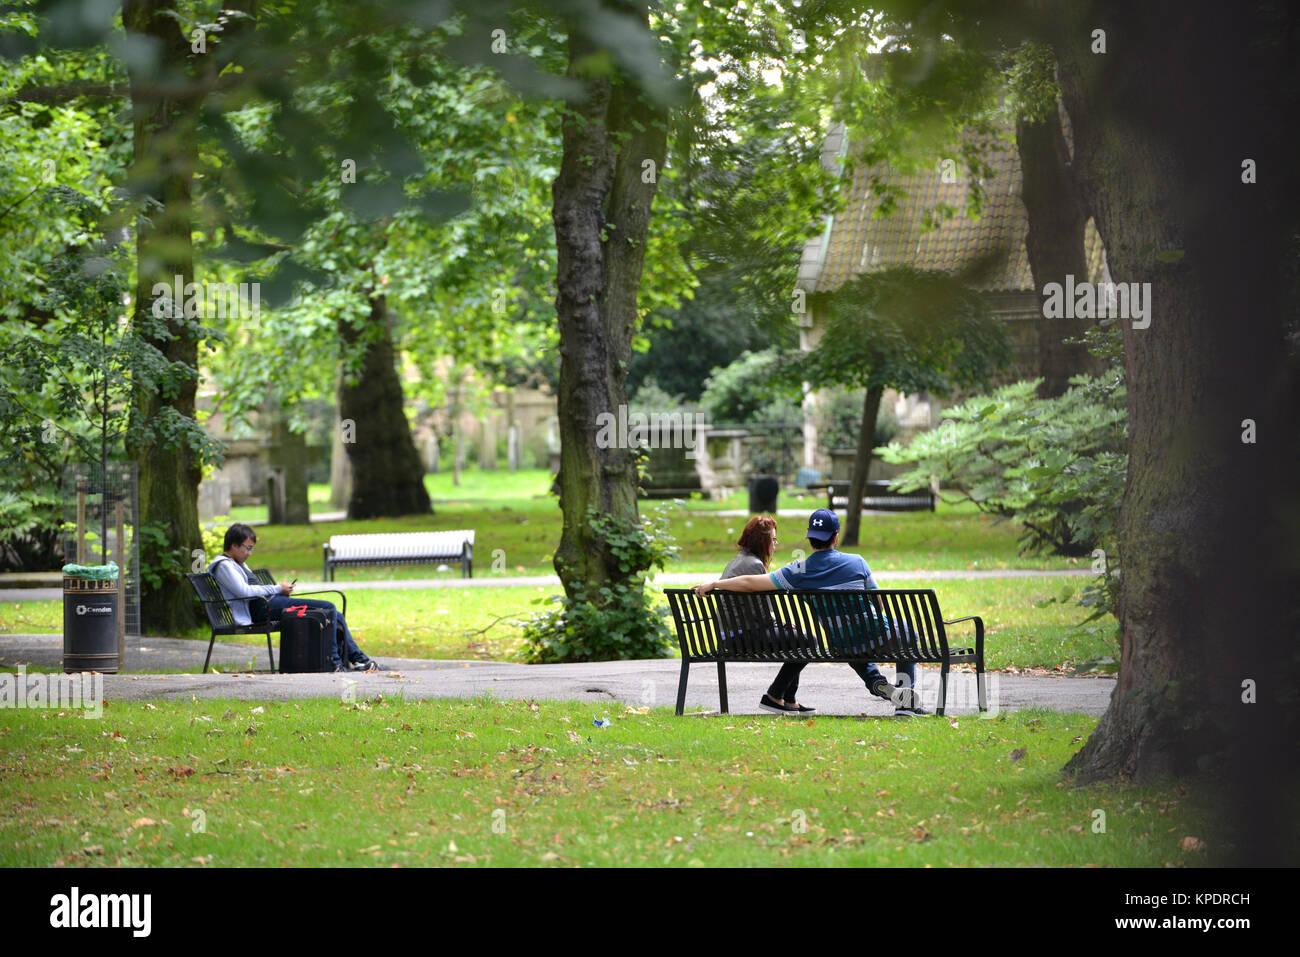 St Pancras Gardens, London - Stock Image